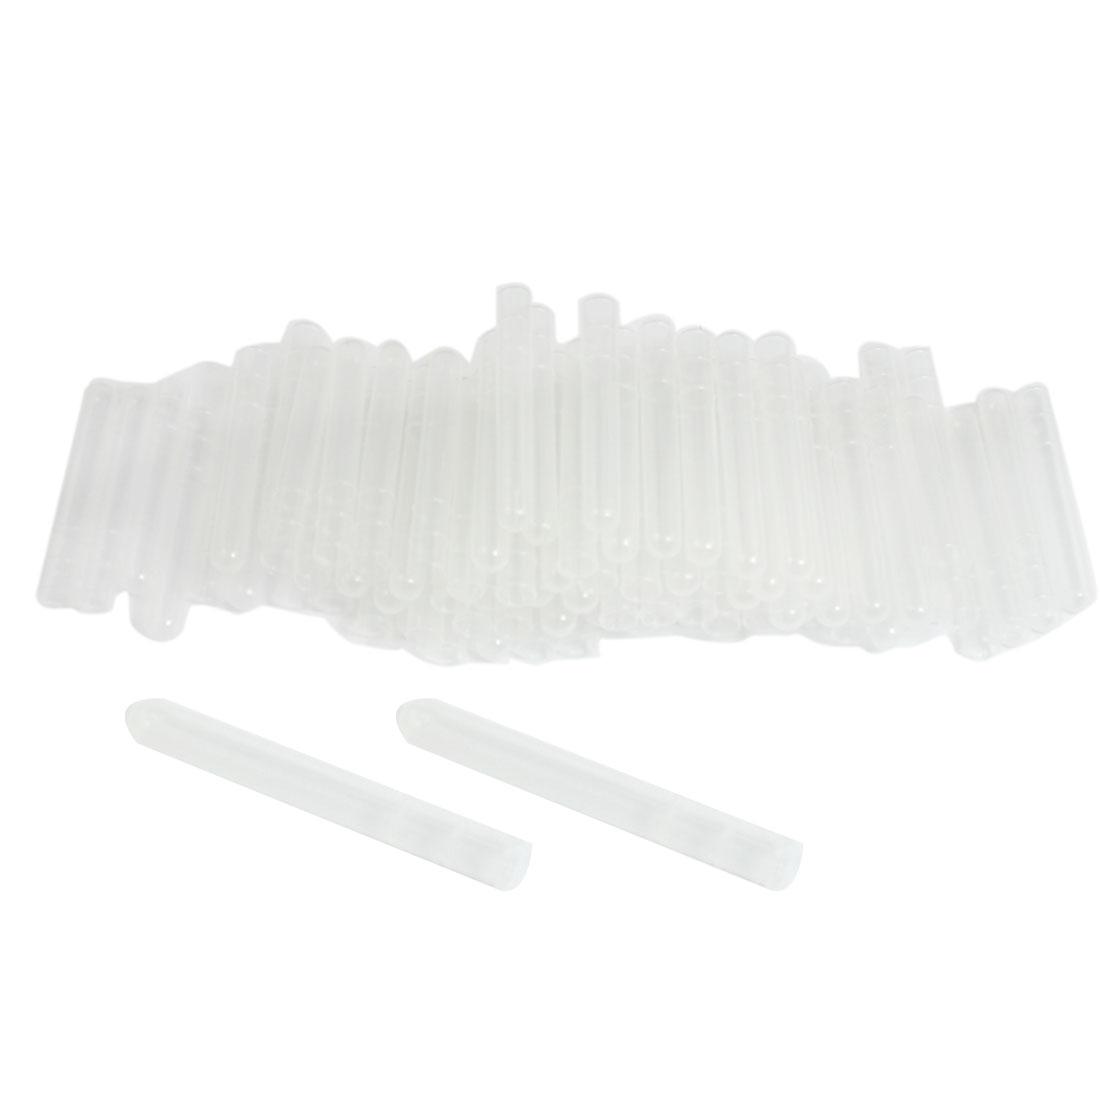 "100 Pcs Clear White Plastic Rounded U-shaped Bottom 3"" Long Test Tube 4ml"